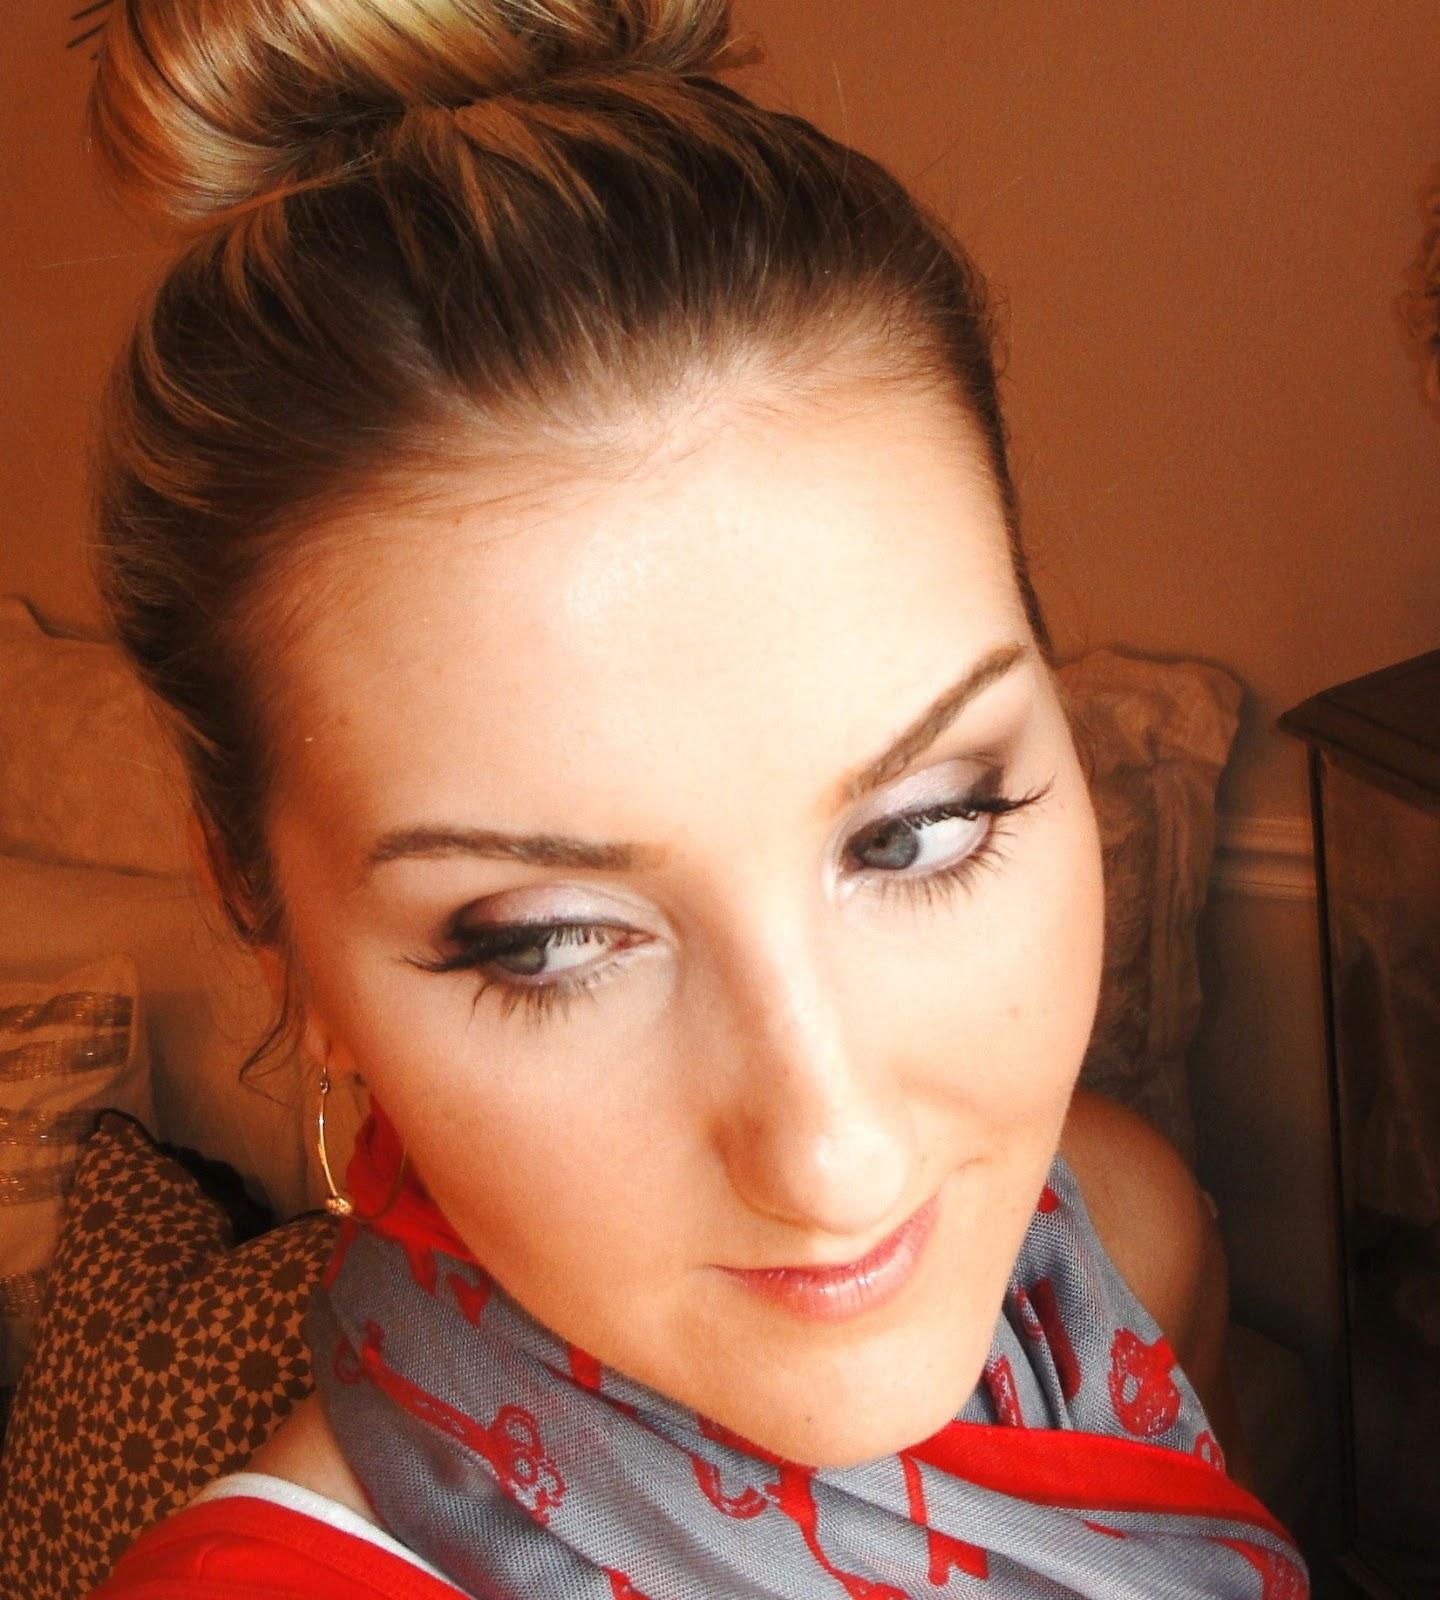 Tiffanyd back to schoolwork makeup tutorial back to schoolwork makeup tutorial baditri Gallery